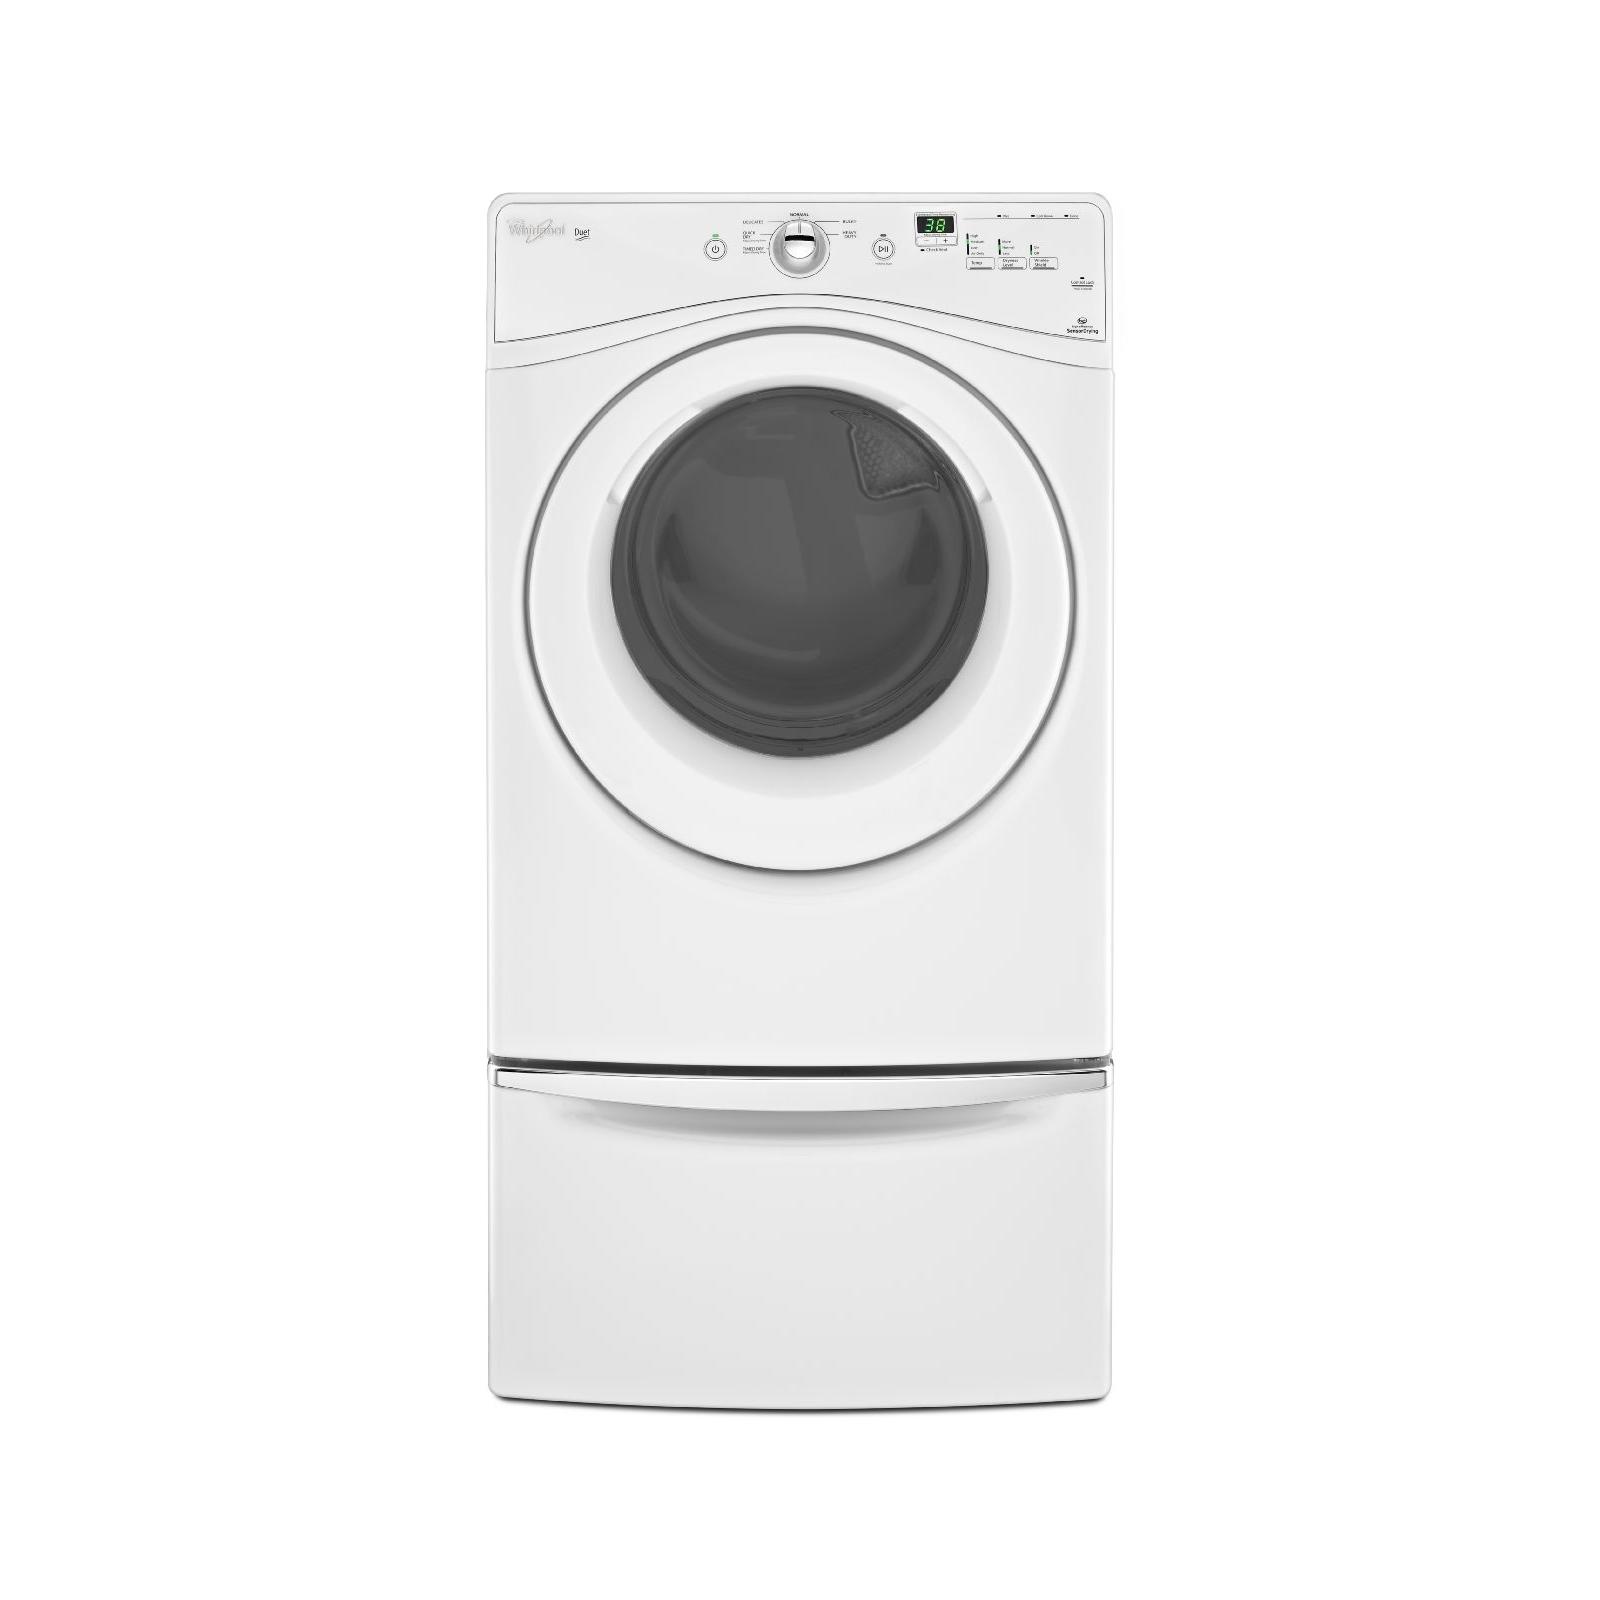 Whirlpool 7.4 cu. ft. Electric Dryer w/ WrinkleShield - White